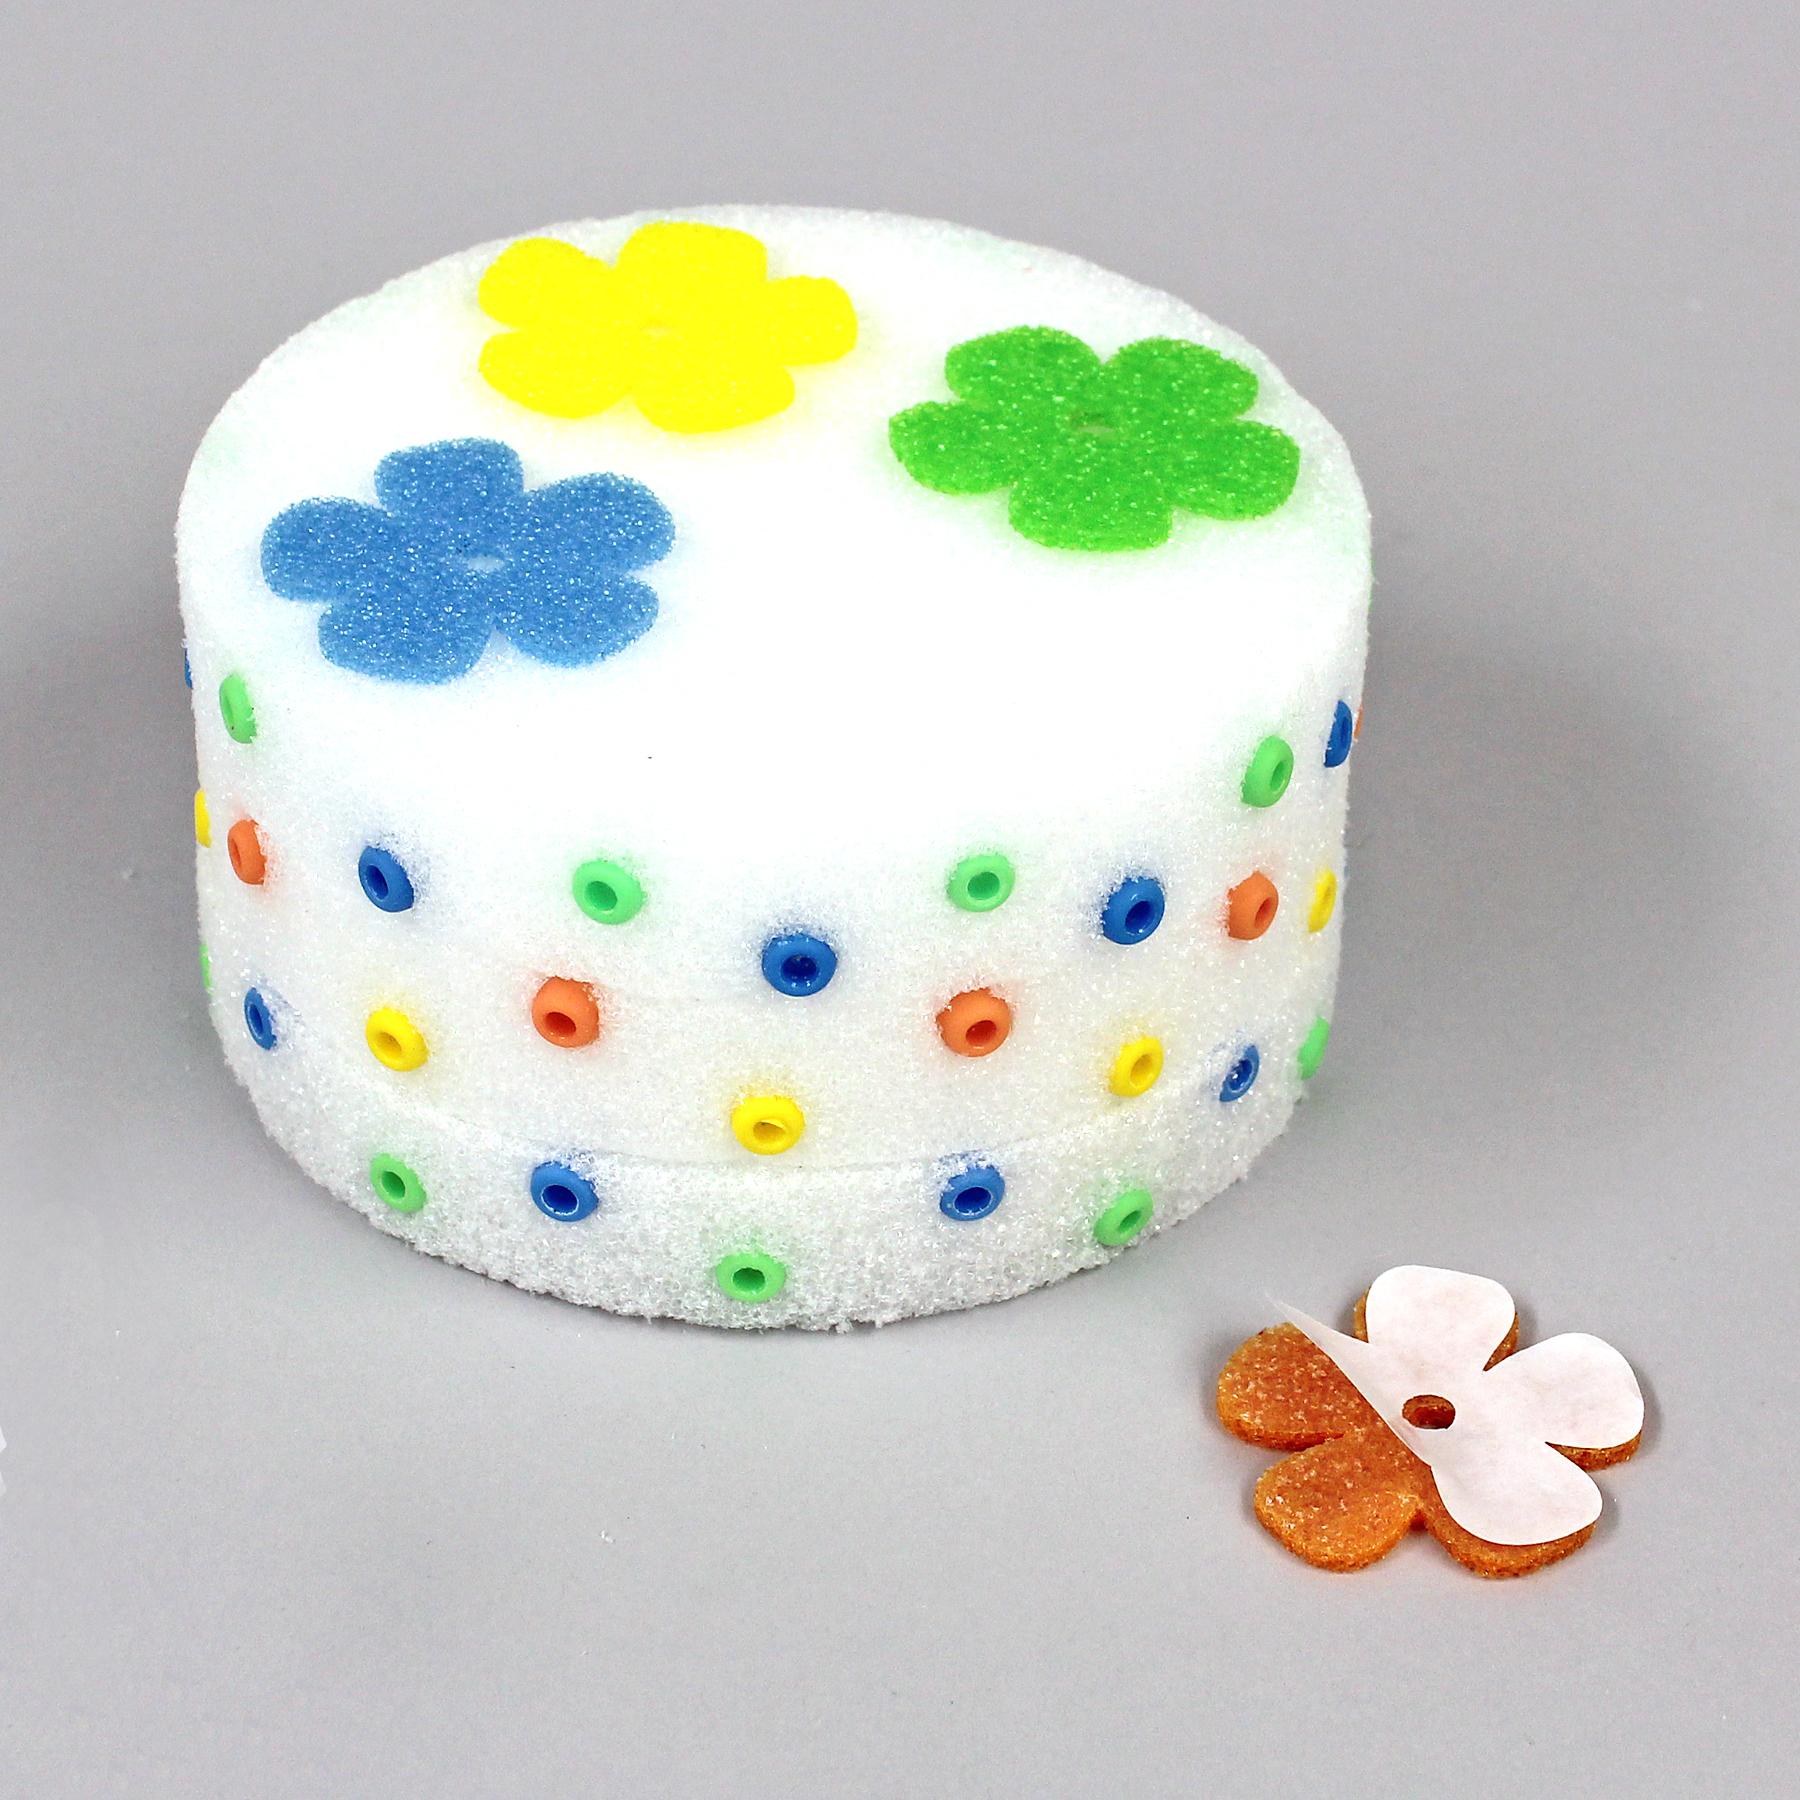 cakecolorgamestepf